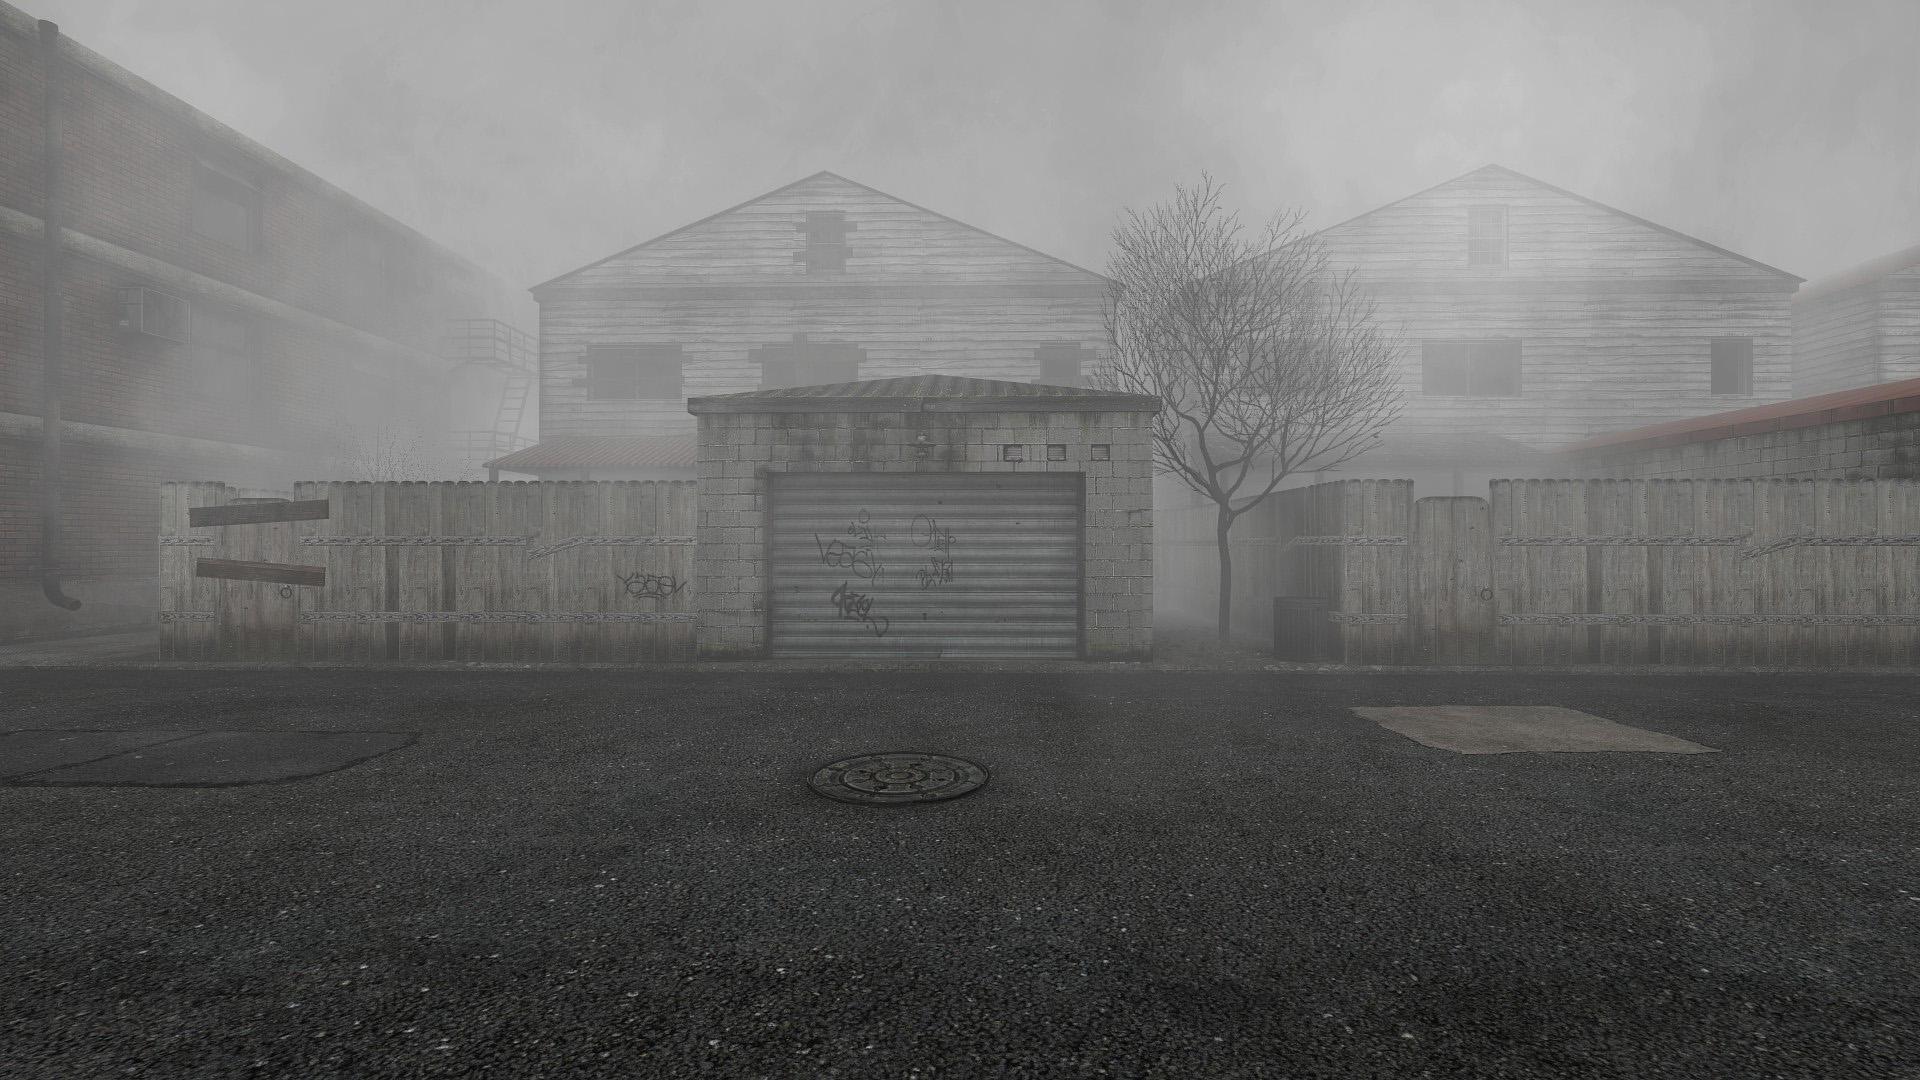 Modifikace Alchemilla do Half-Life 2 pro fanoušky Silent Hillu 104705